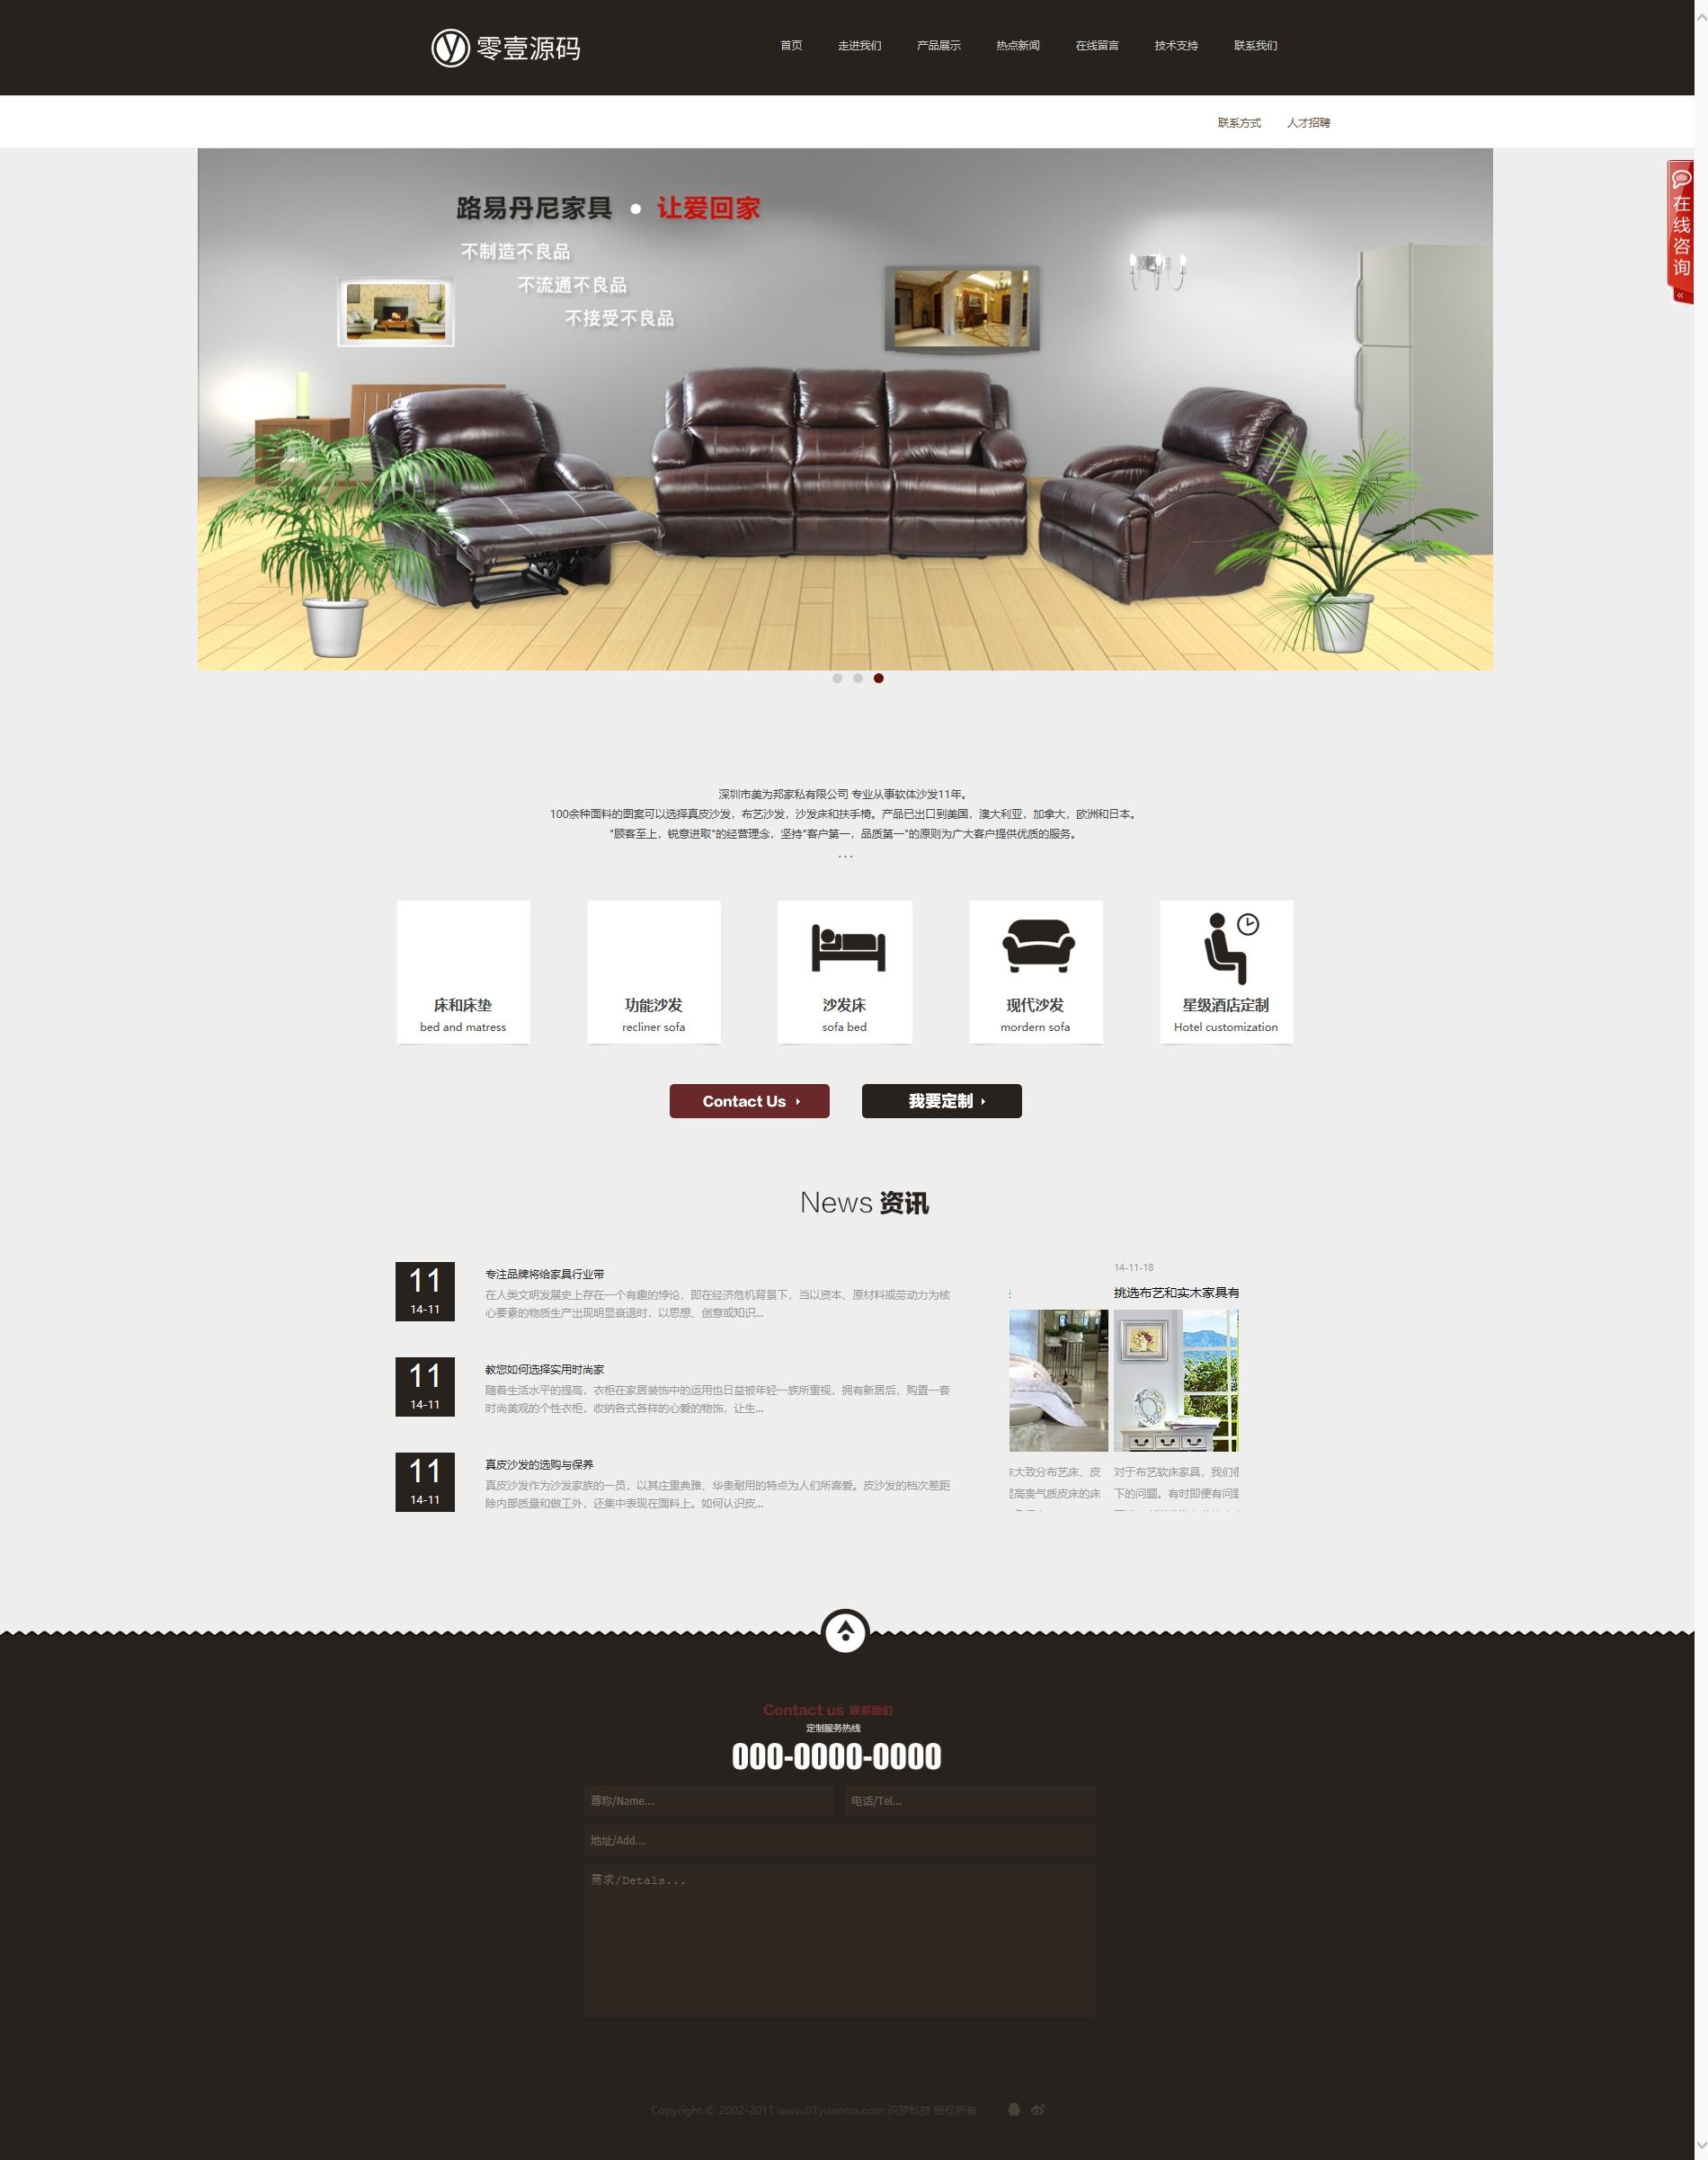 html5高端织梦dedecms装修建筑/装饰建材/办公家具通用公司企业模板